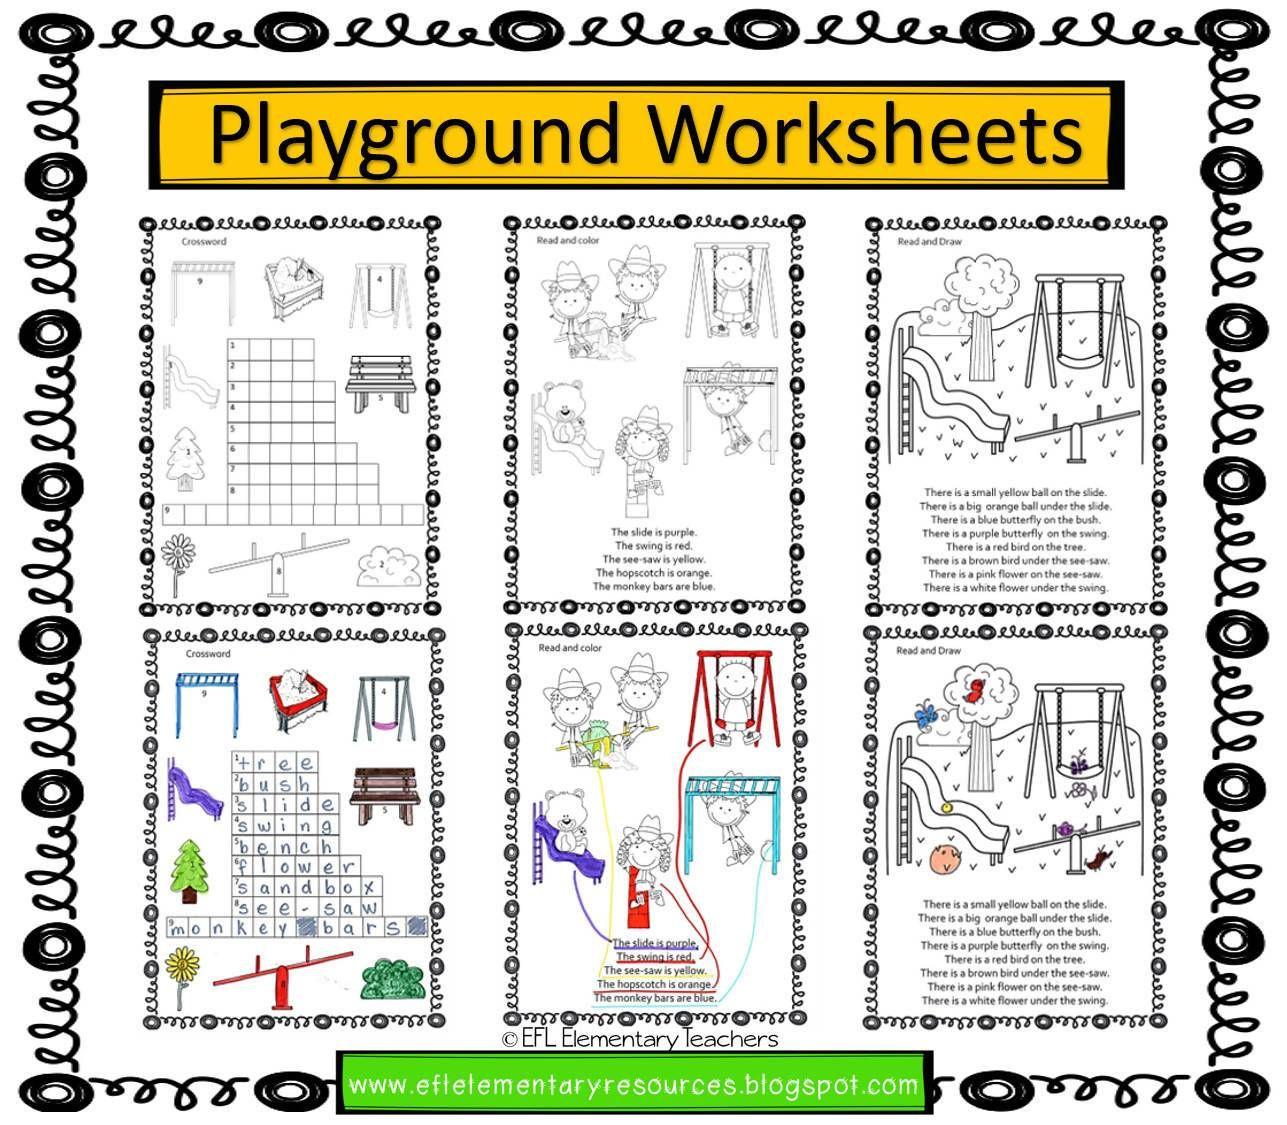 Playground Park Recess Verbs Theme For Elementary Ell In 2021 Elementary Playground Elementary Resources [ 1125 x 1287 Pixel ]